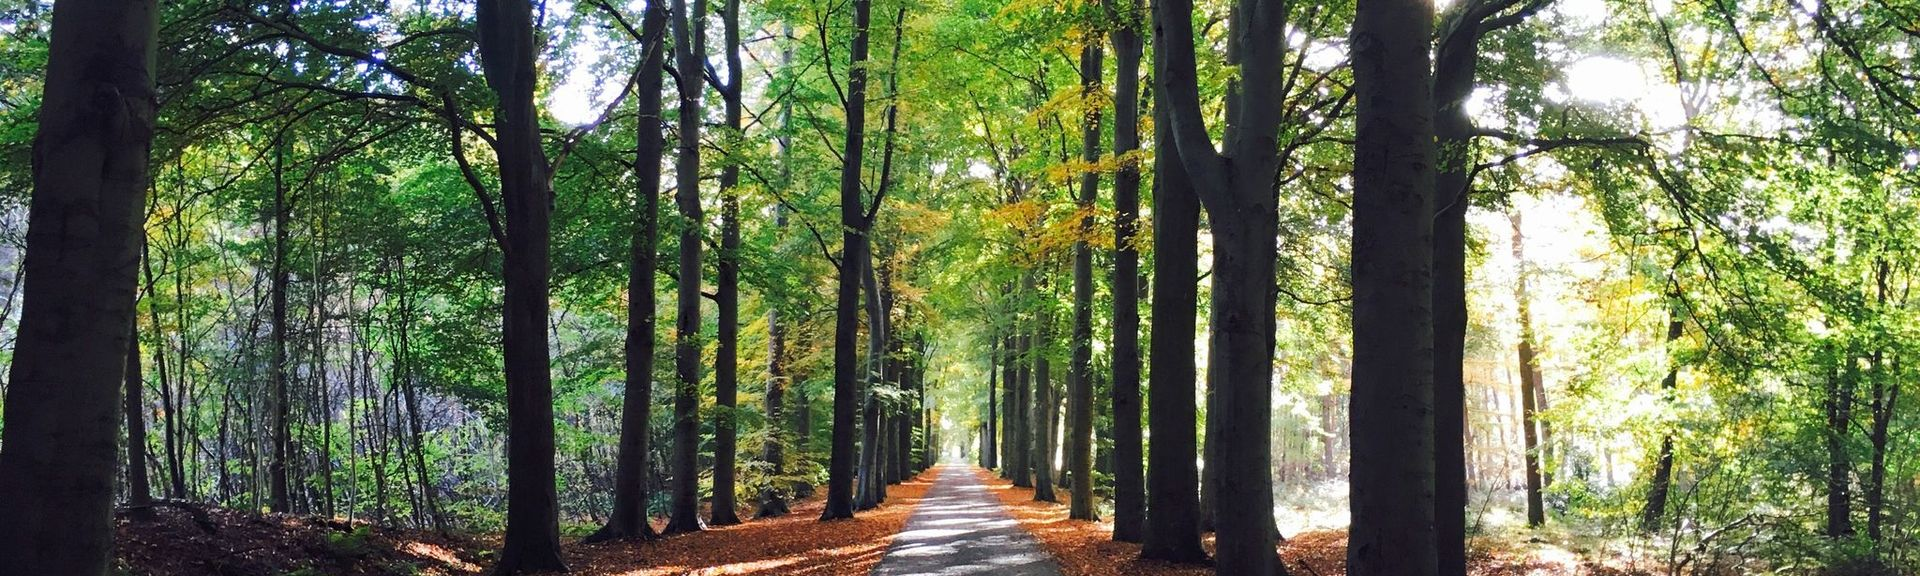 Doldersum, Drenthe, Pays-Bas